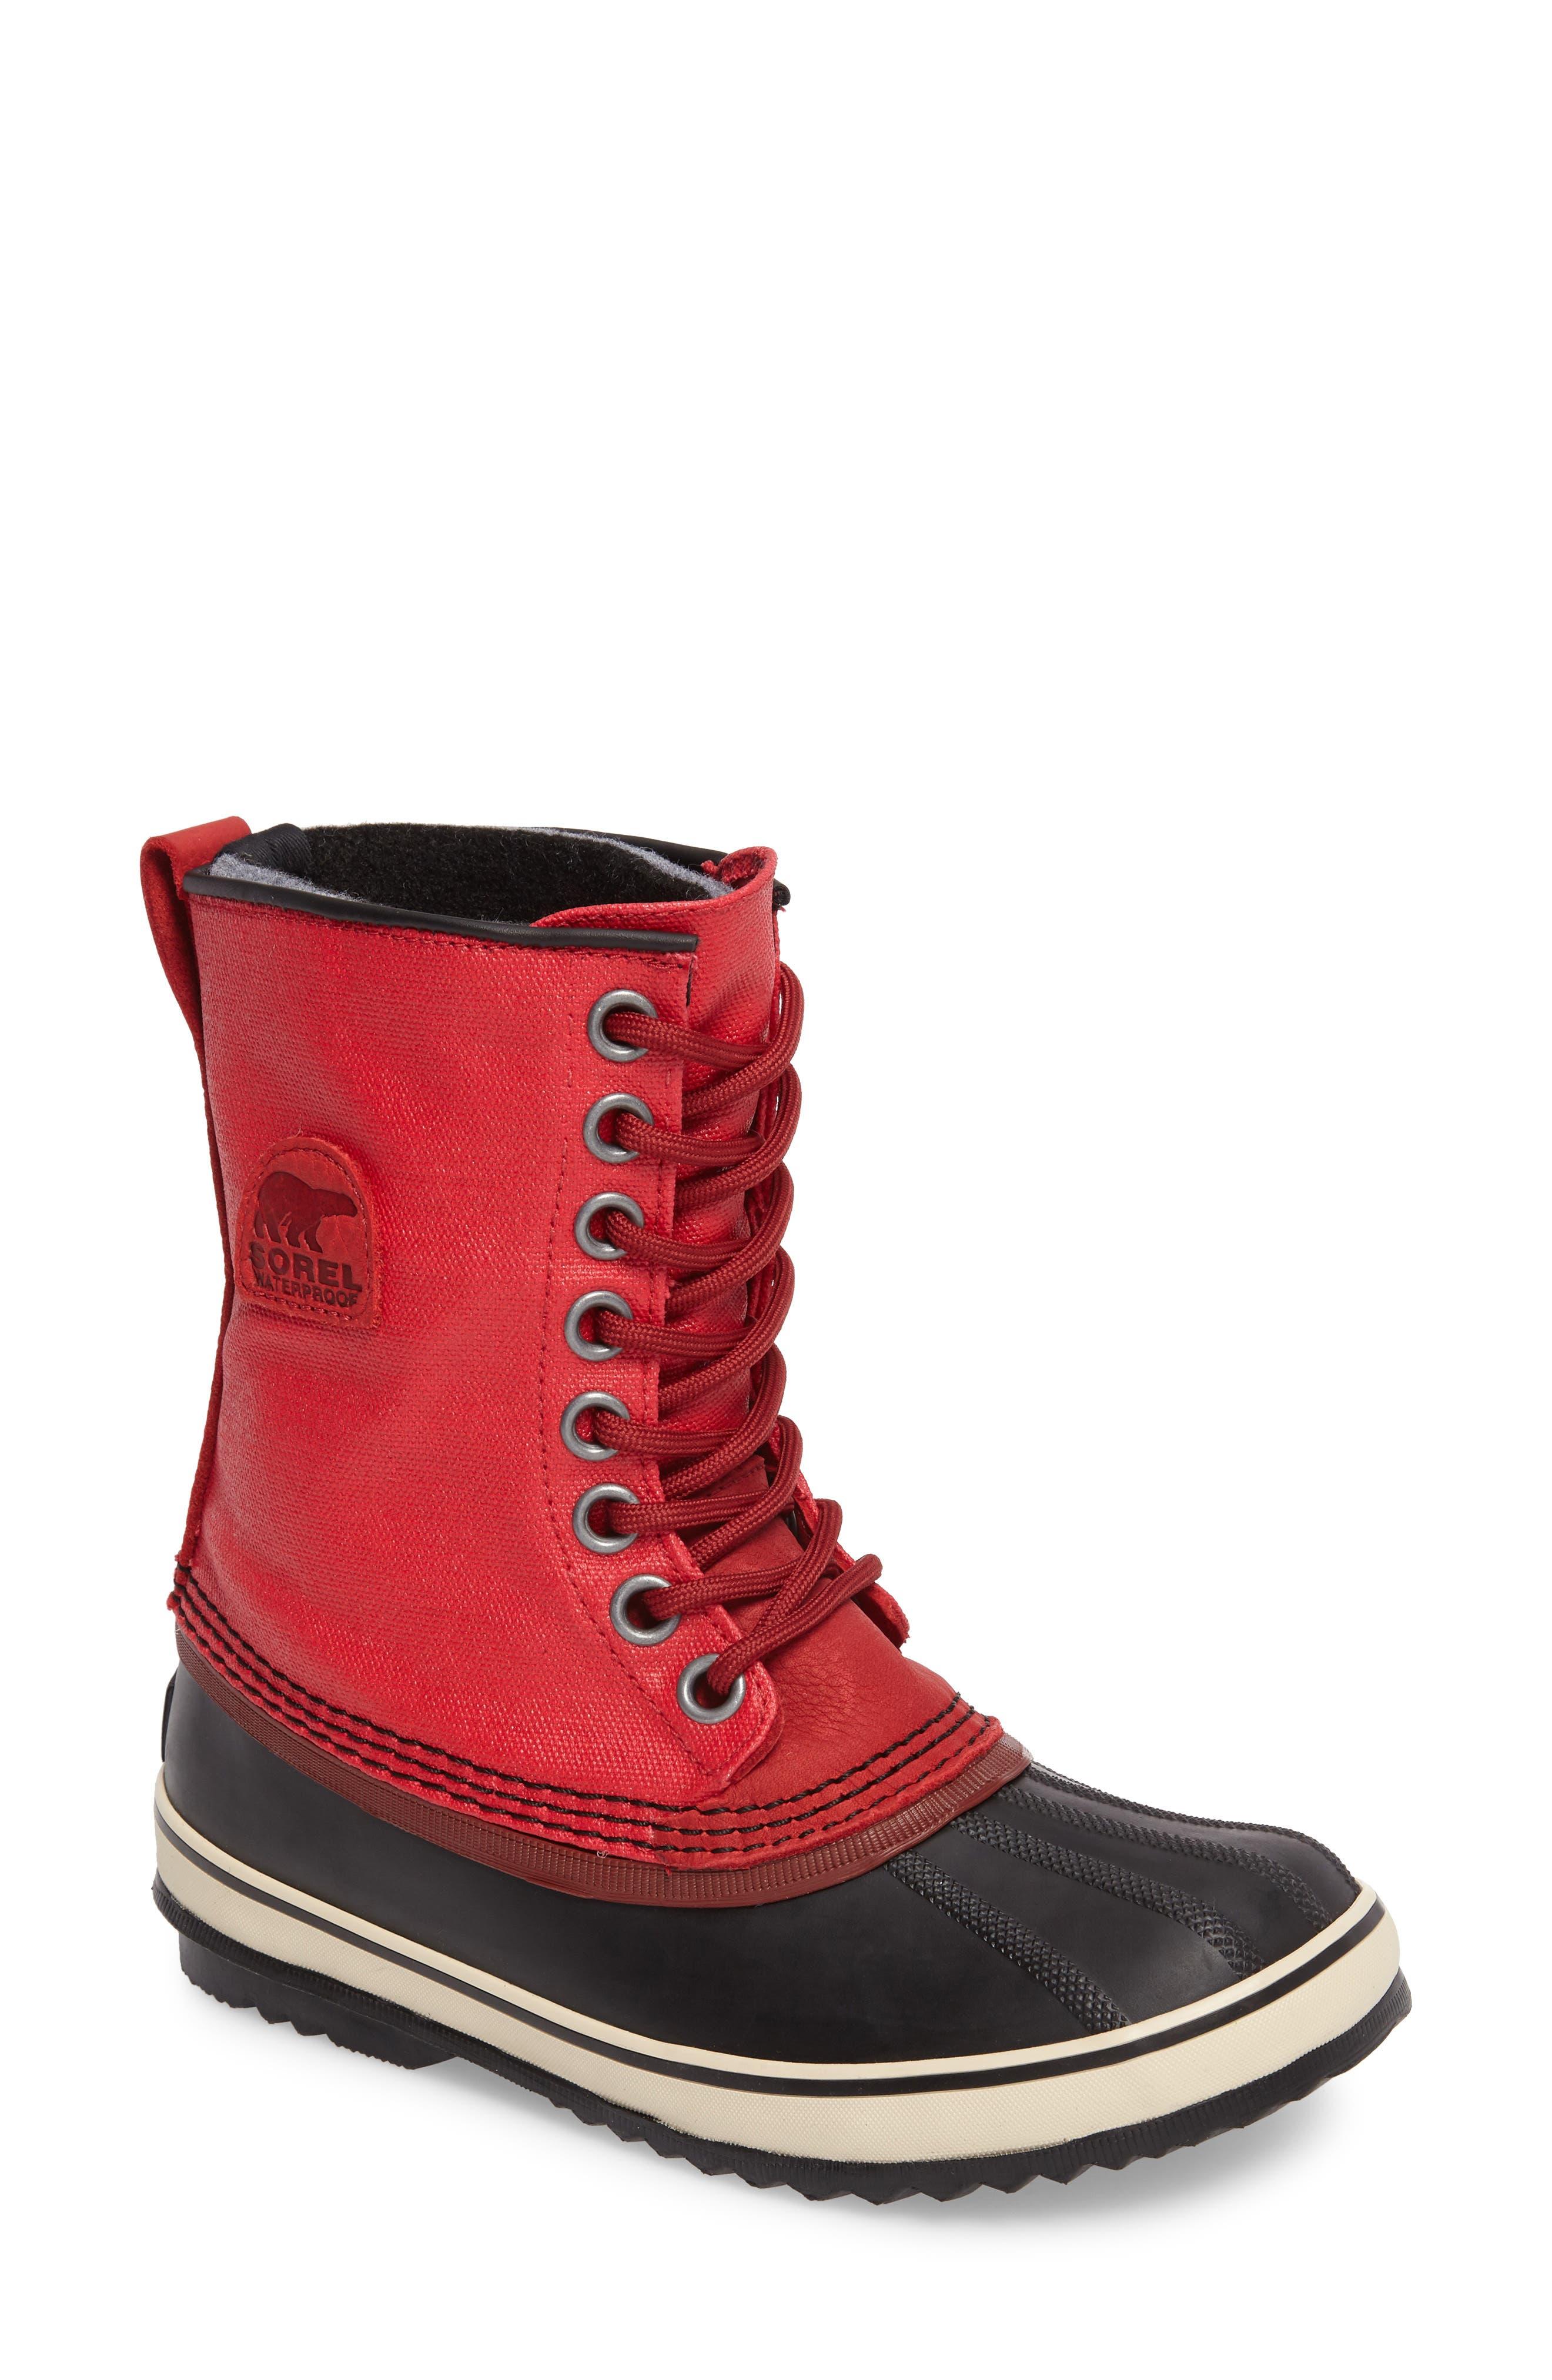 ba383c507d50 Sorel  1964 Premium  Waterproof Boot